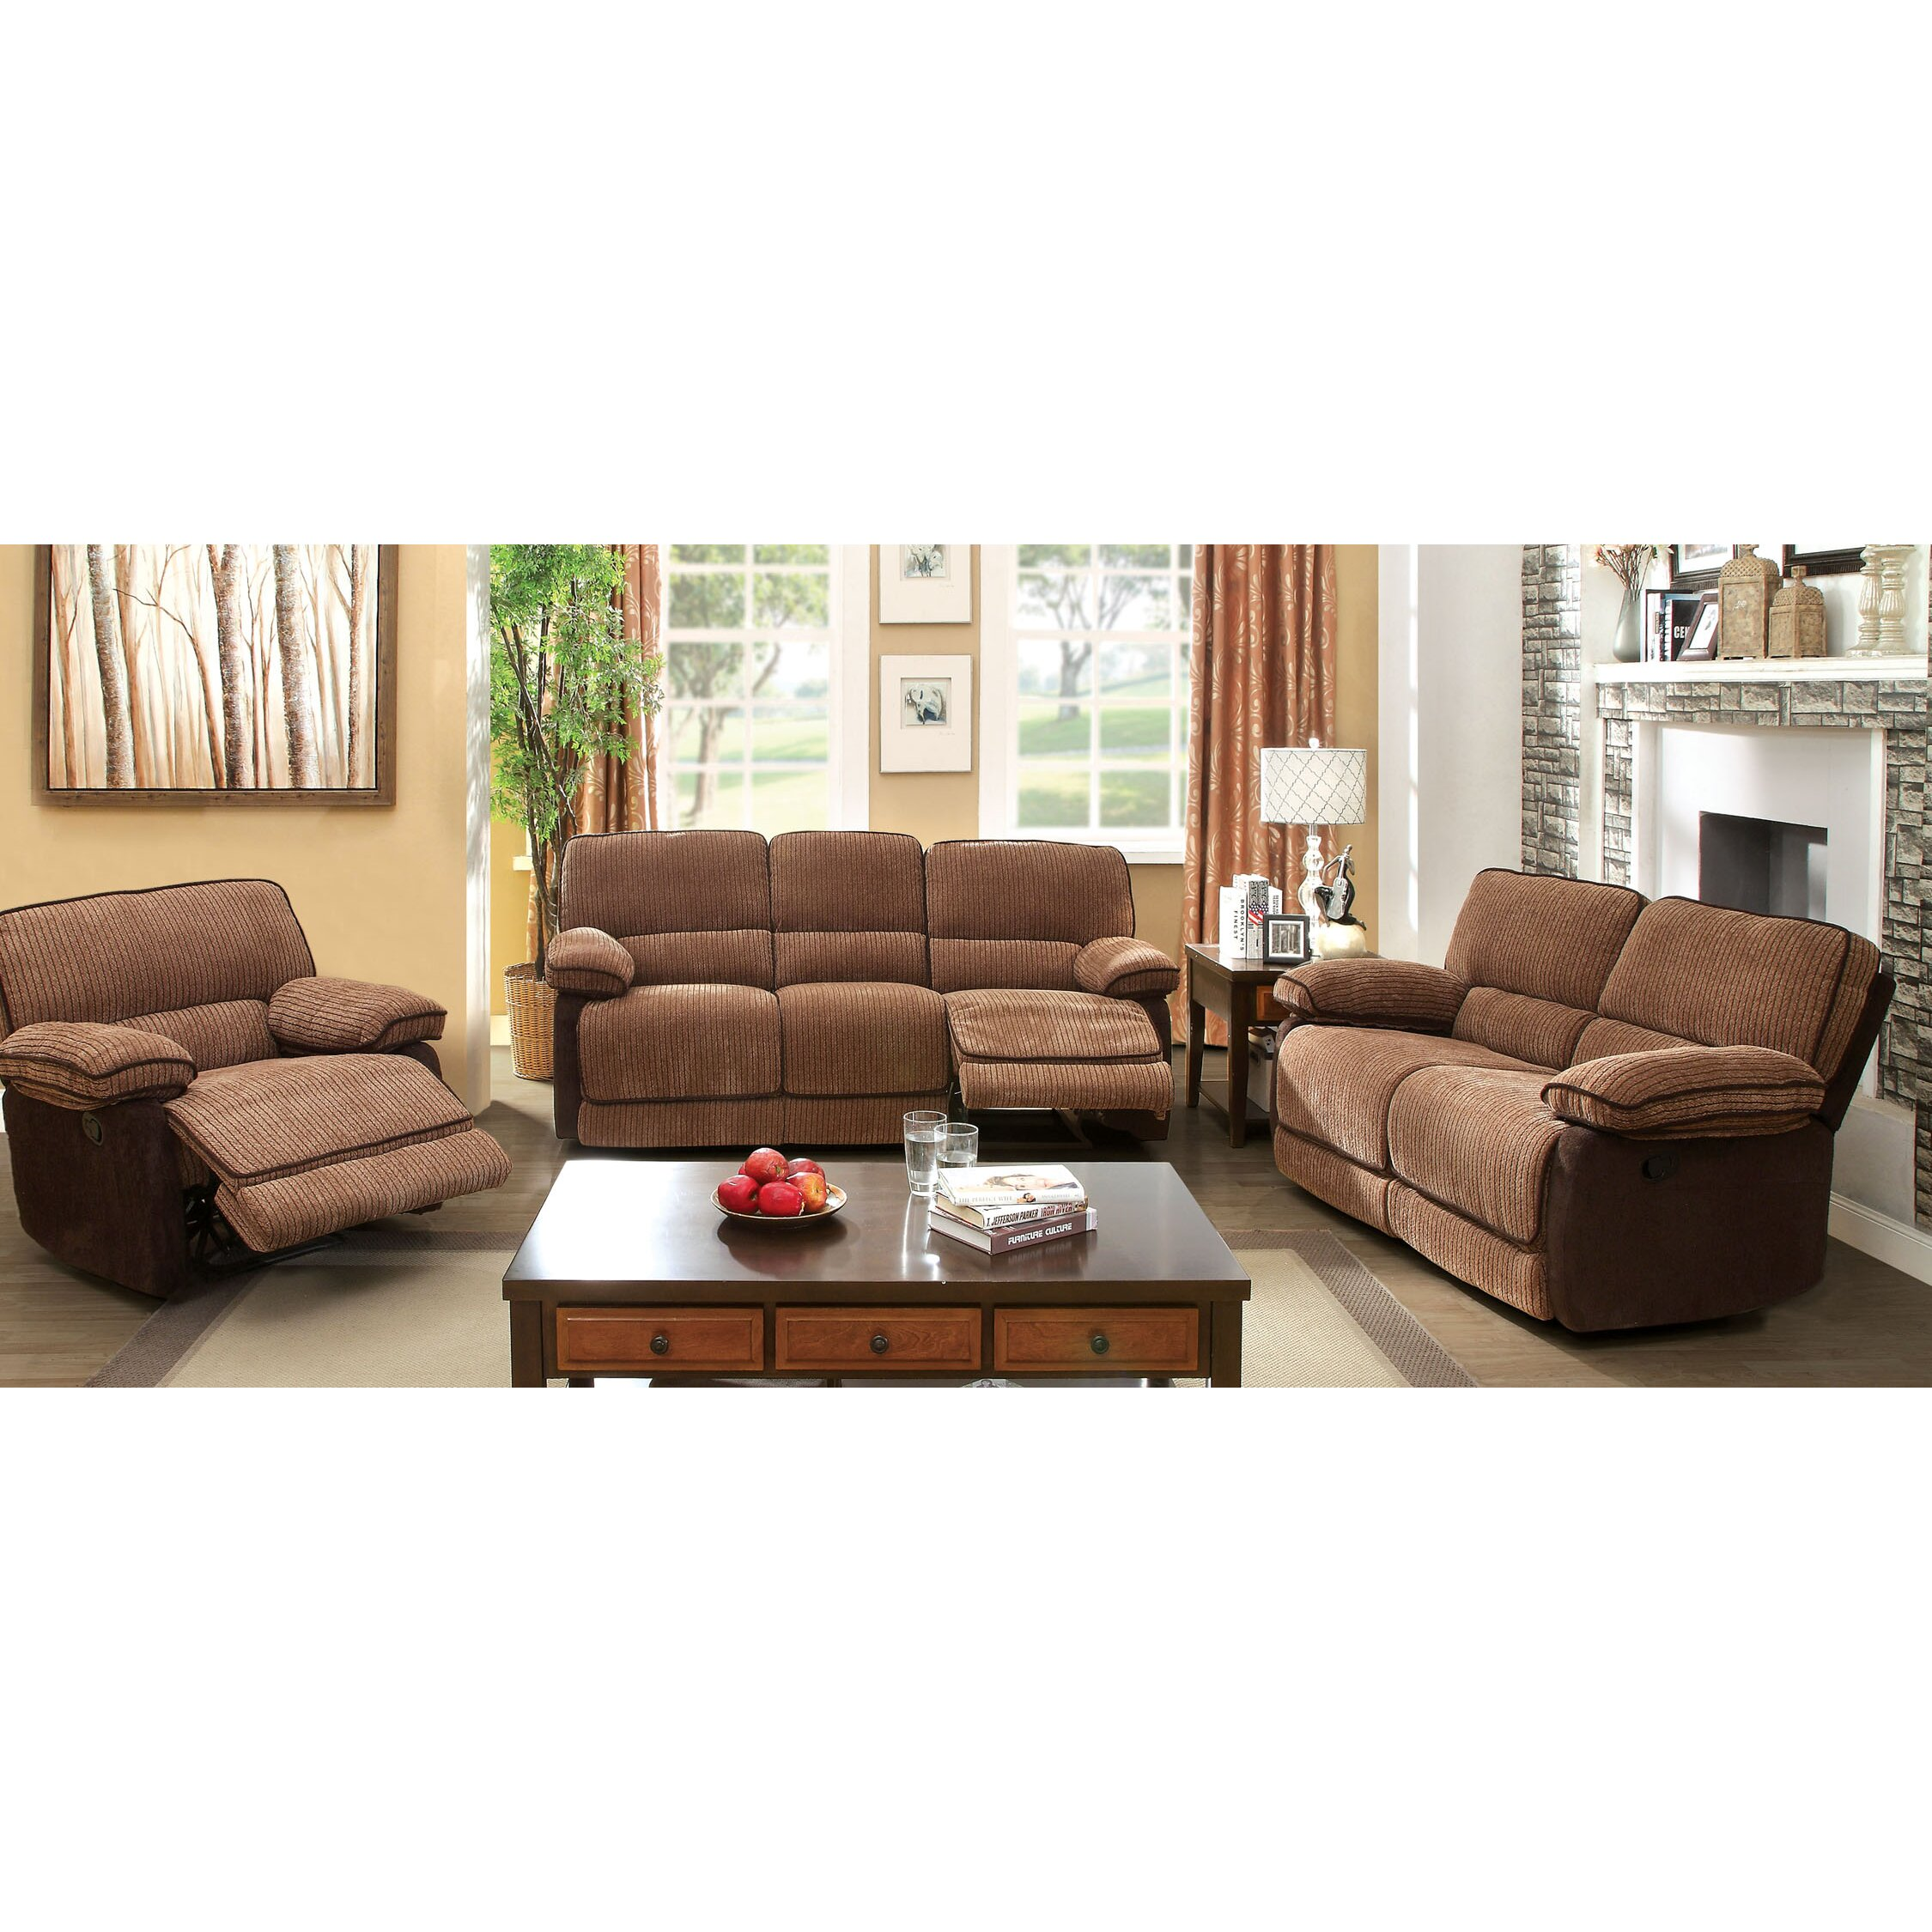 Hokku designs denitze reclining loveseat reviews wayfair for Hokku designs living room furniture